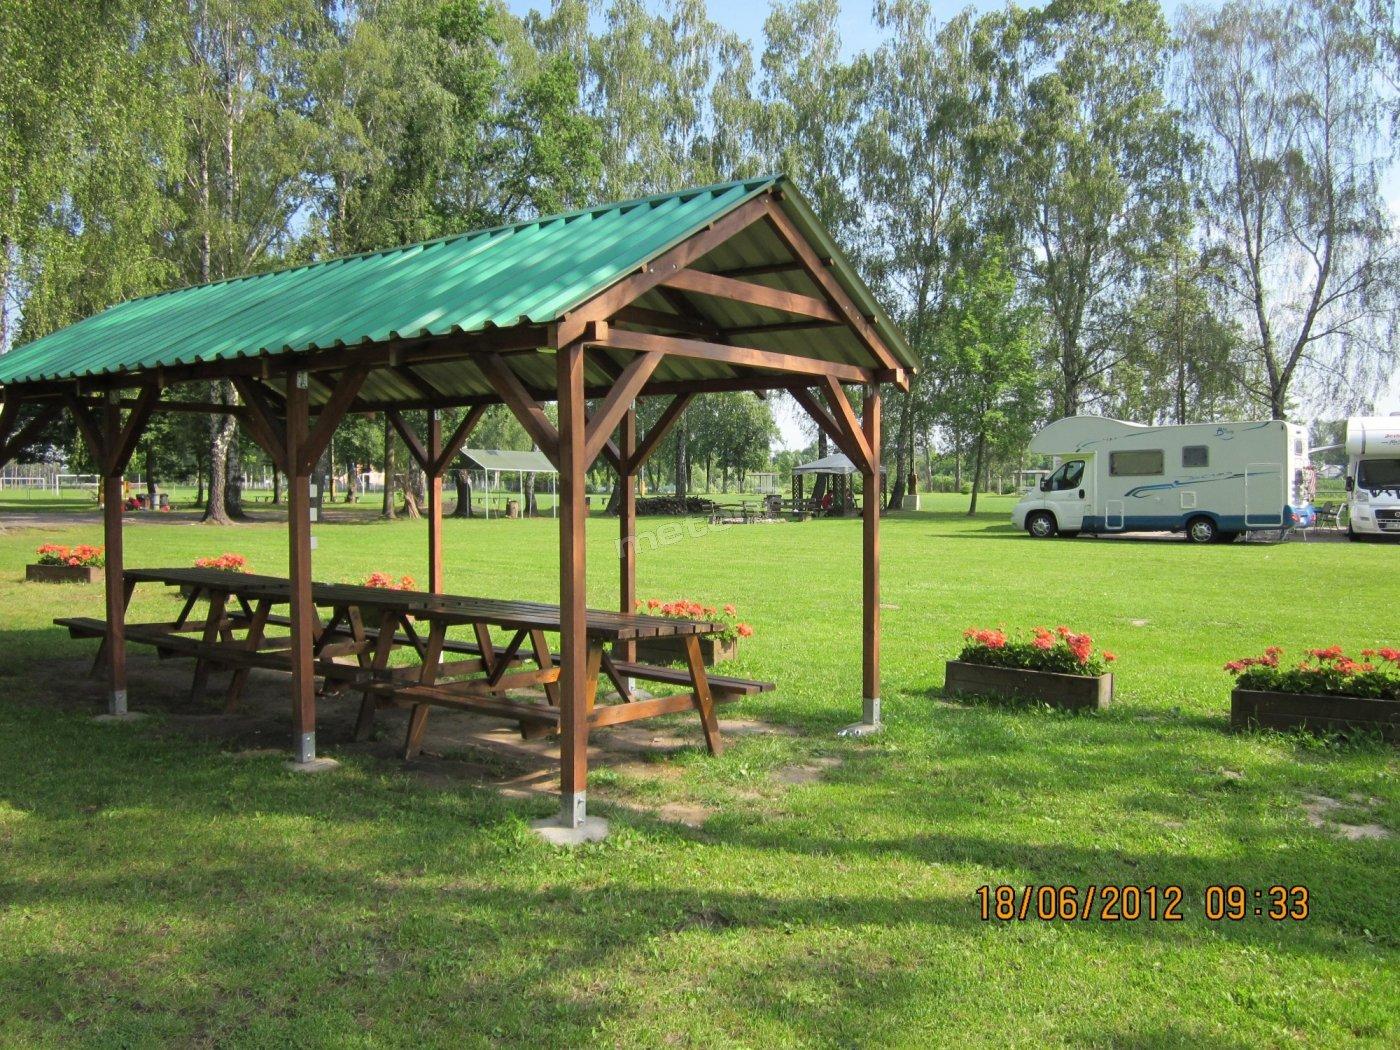 Kórnickie Centrum Rekreacji i Sportu BŁONIE